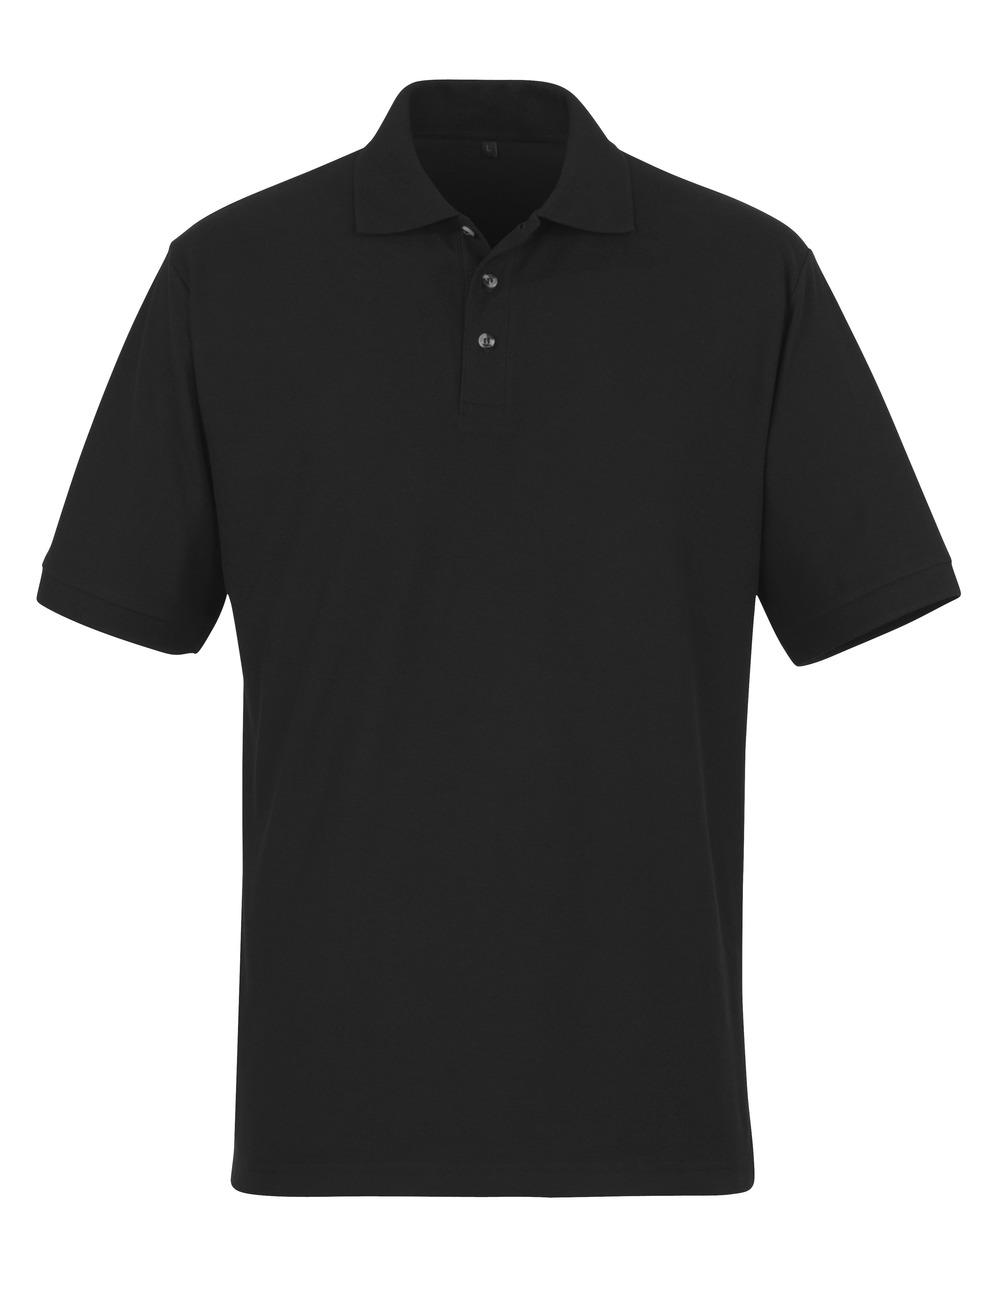 50200-922-B26 Polo-Shirt - Vollschwarz